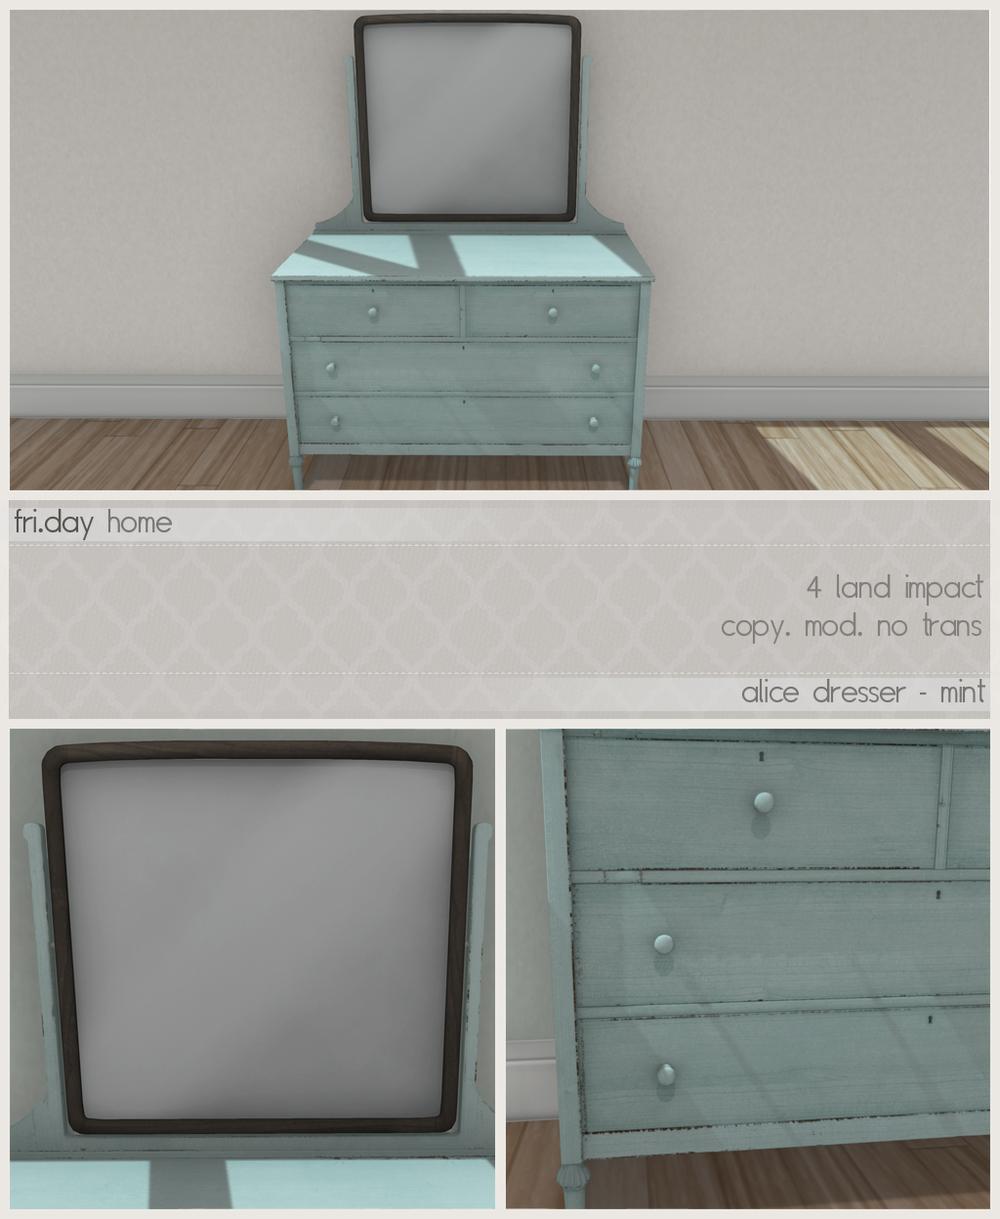 frihome - alice dresser ad (mint).jpg